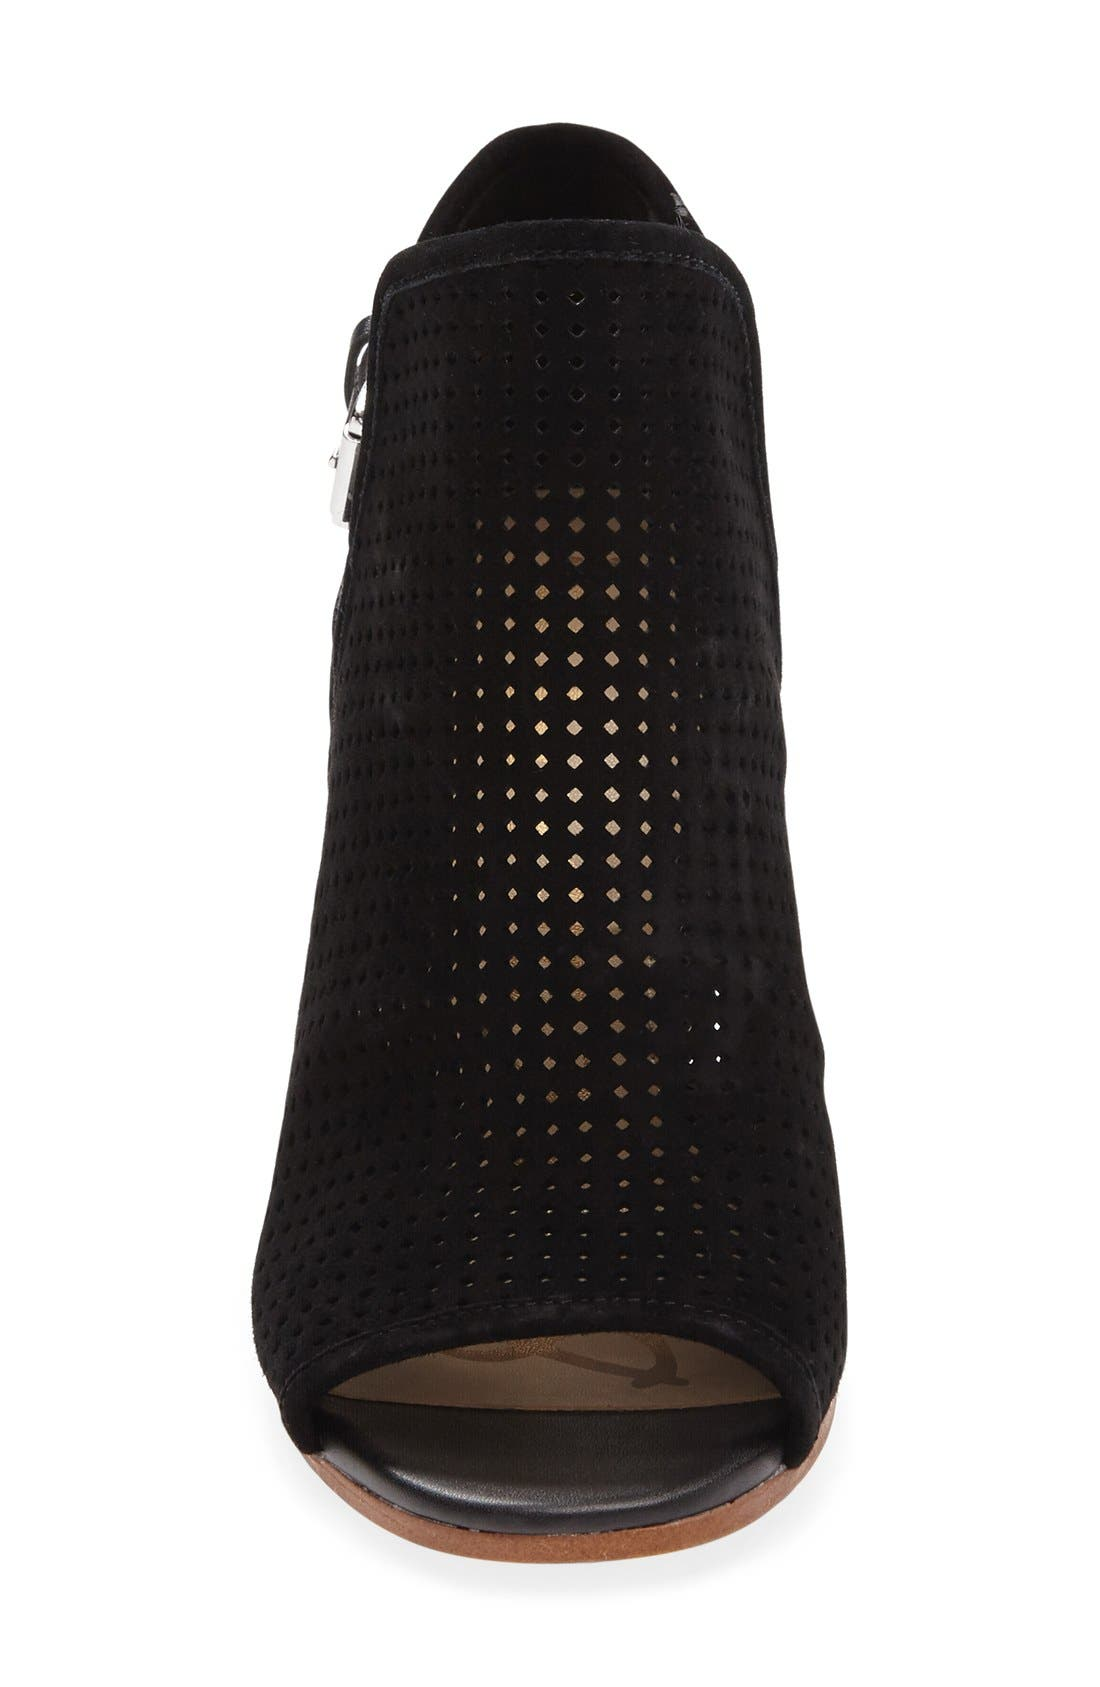 Alternate Image 3  - Sam Edelman Easton Perforated Open Toe Bootie (Women)